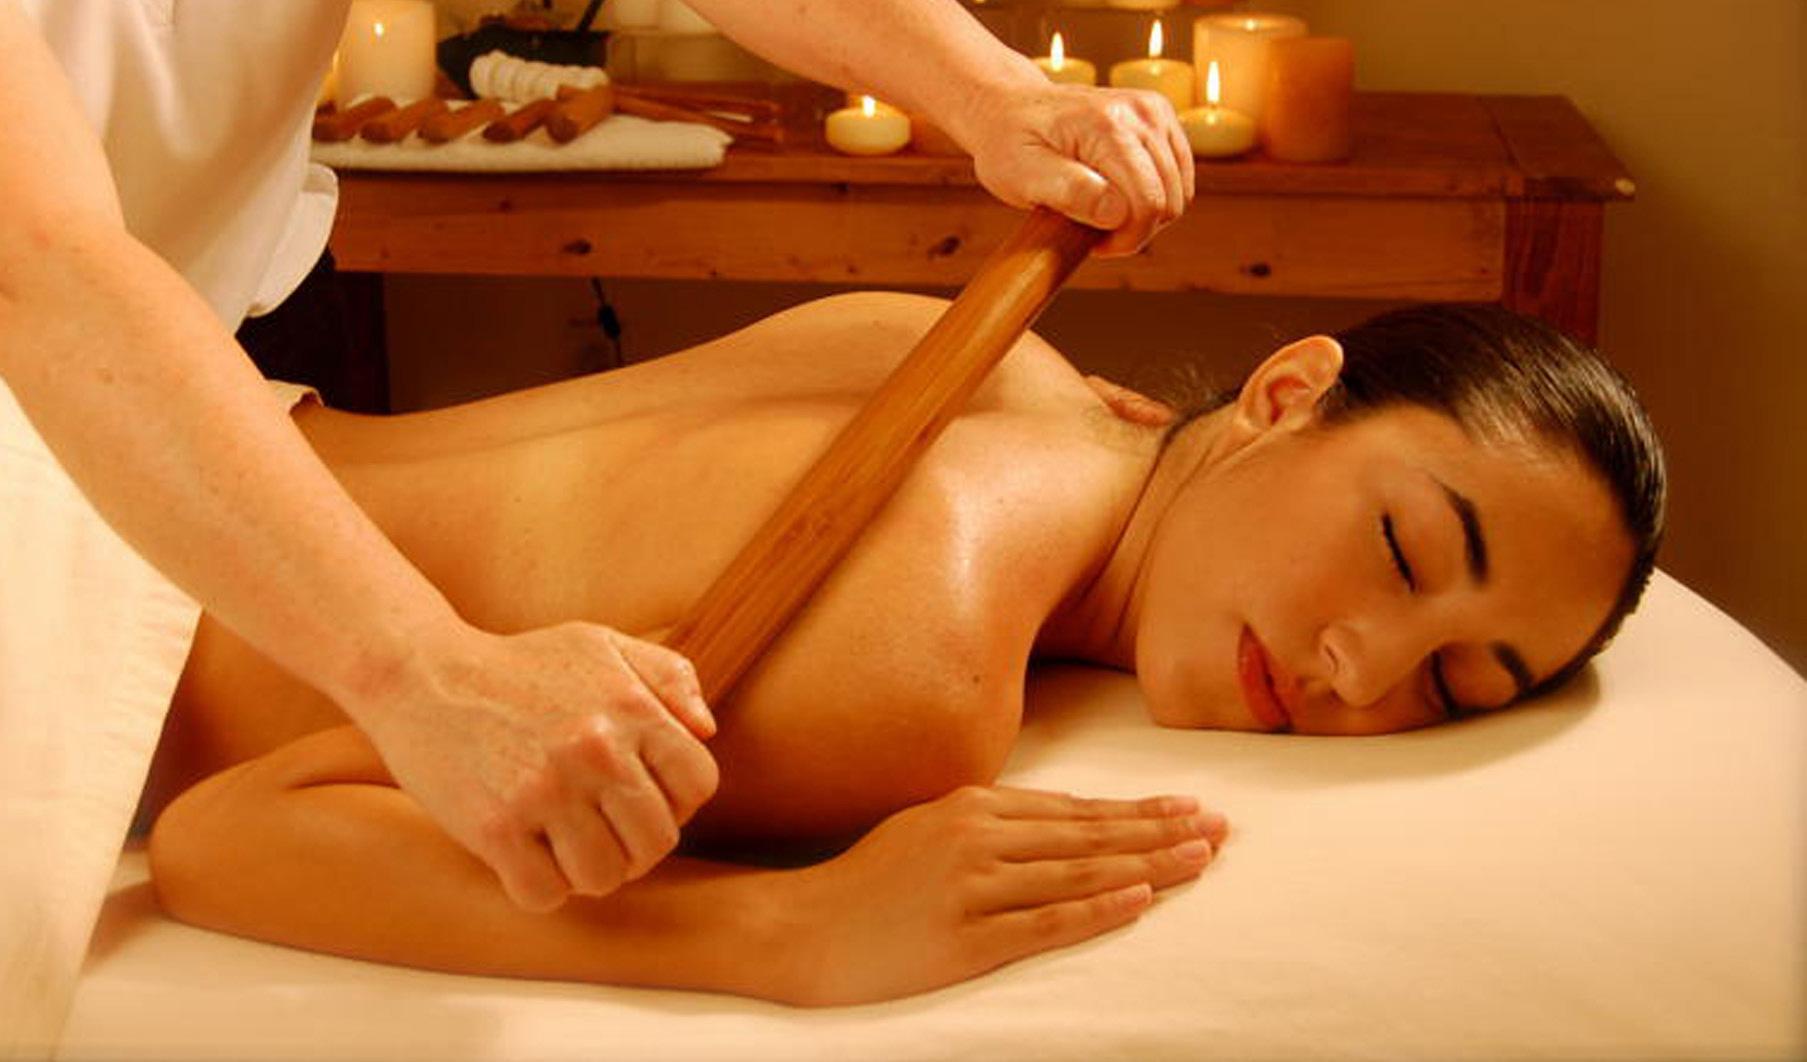 Jenis Massage dan Khasiat Pijatan Bambu